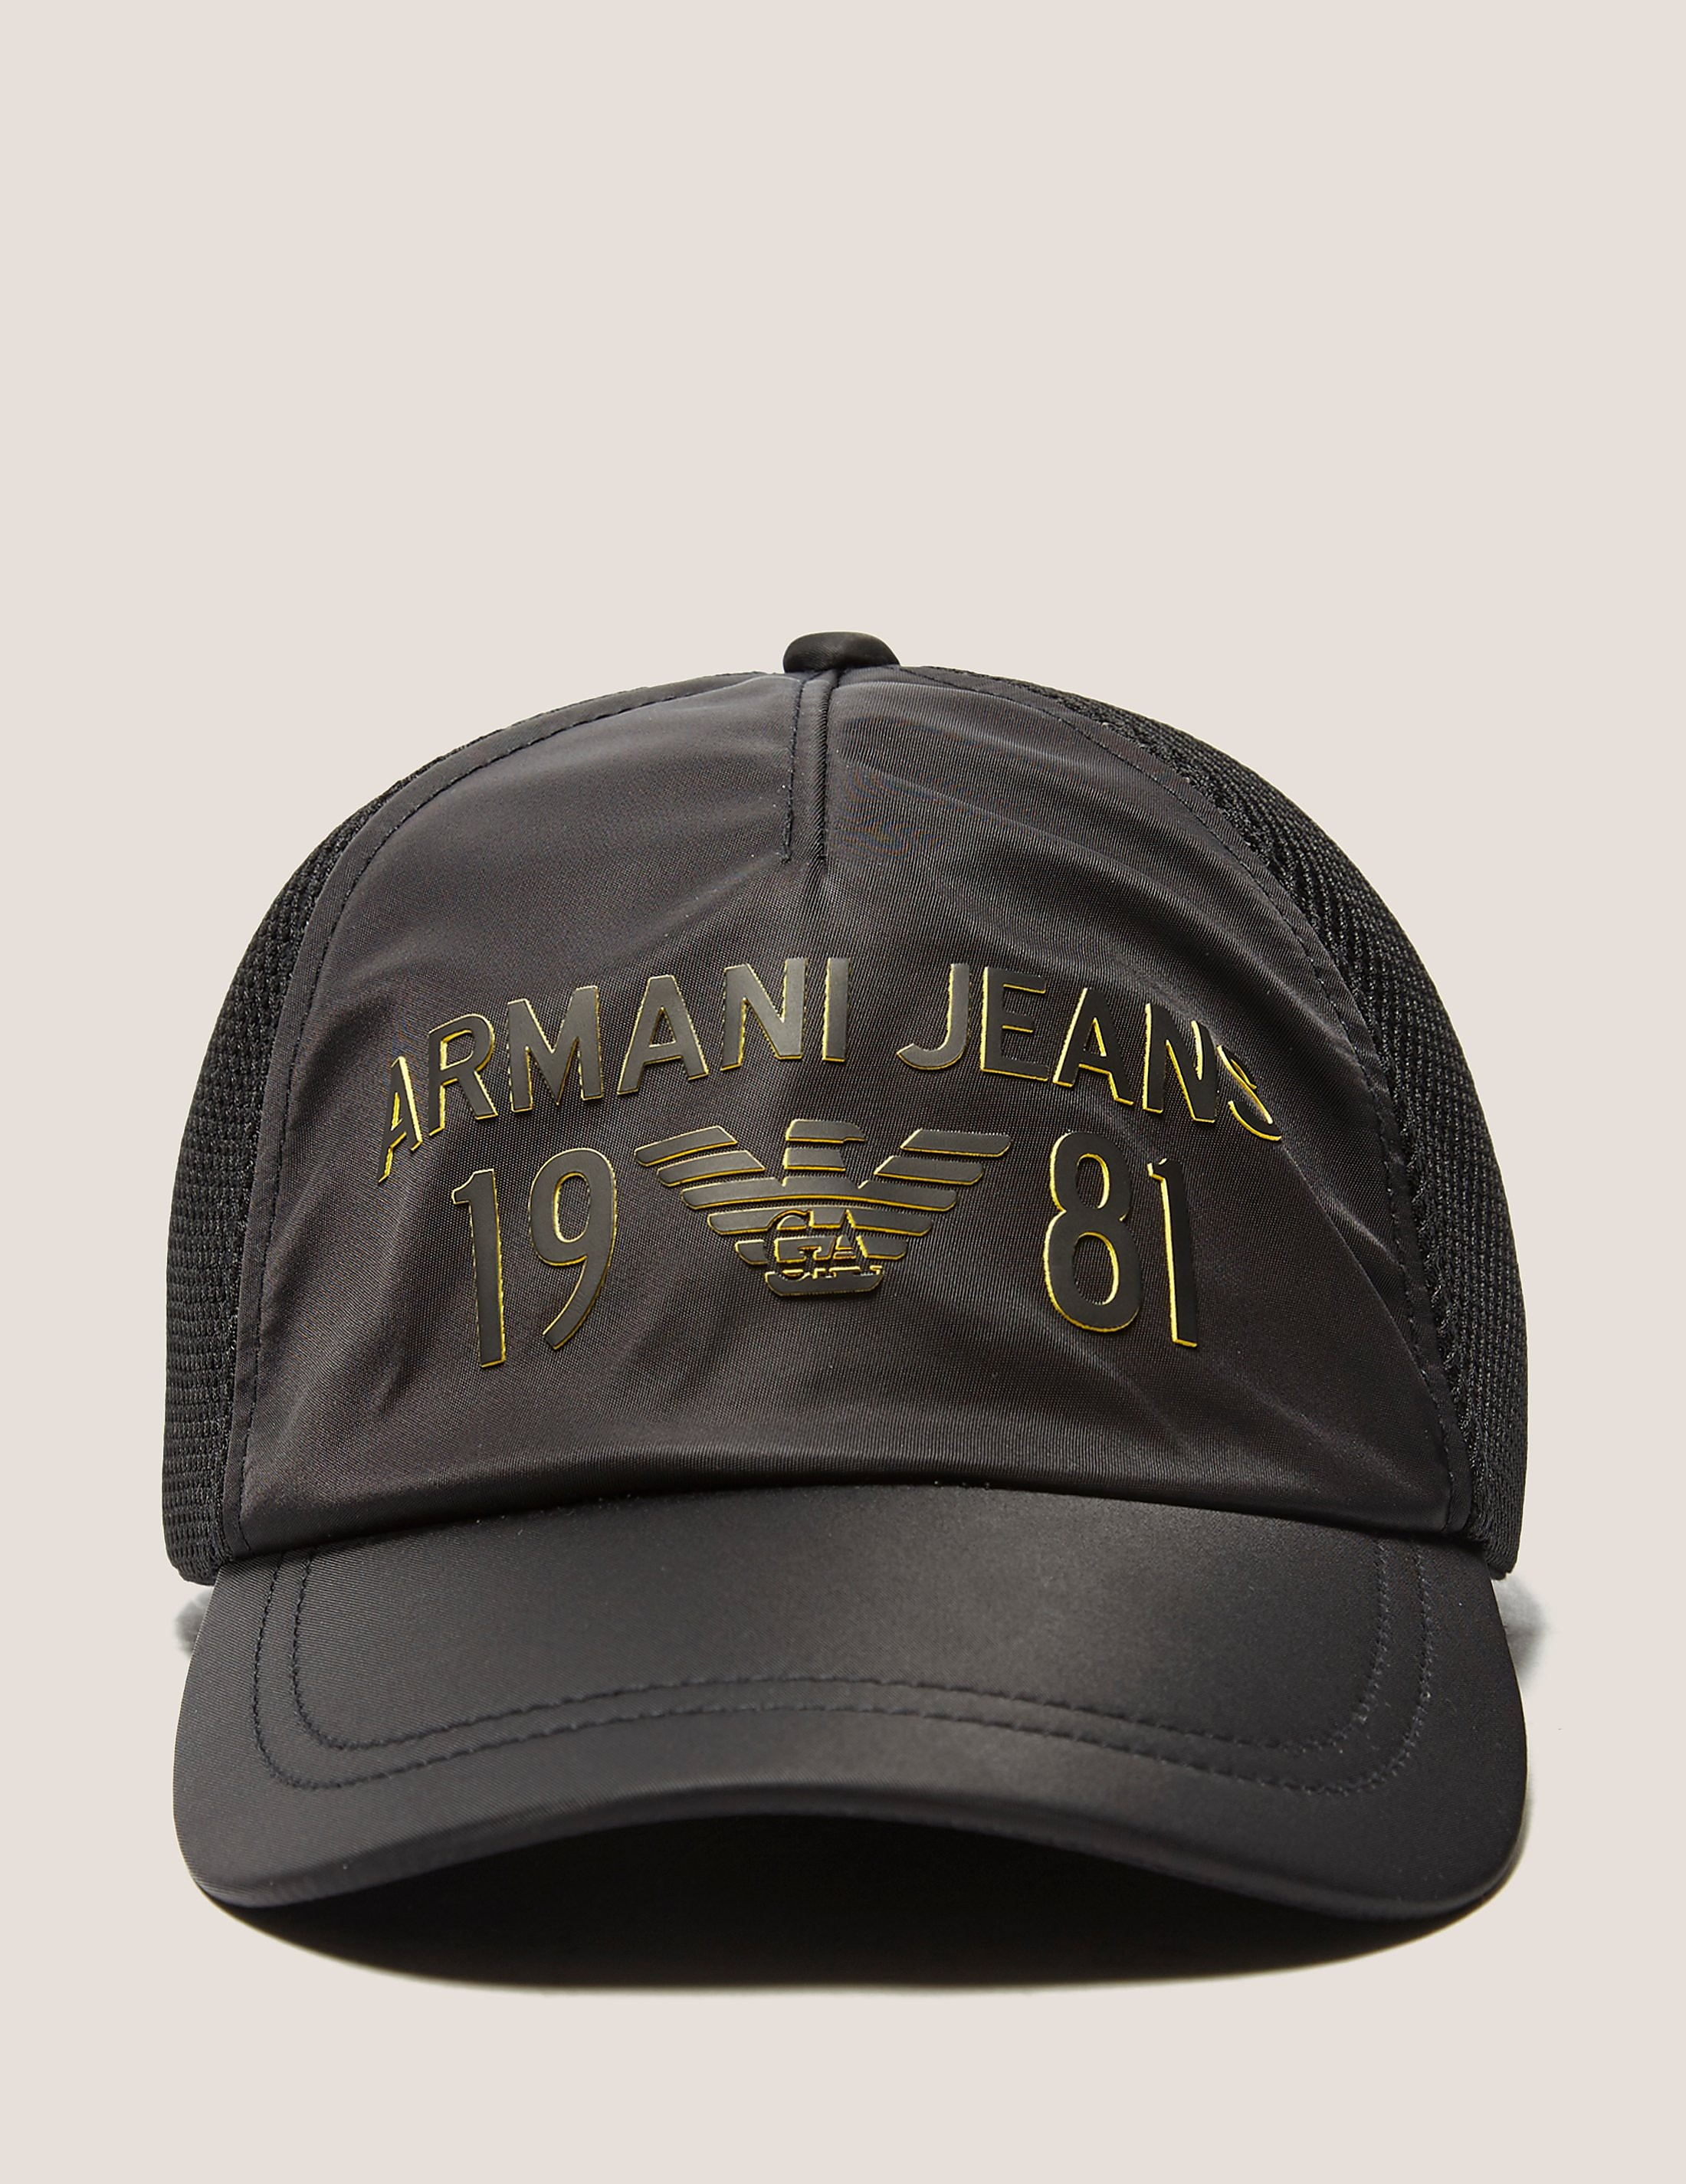 Armani Jeans Large Logo Baseball Cap